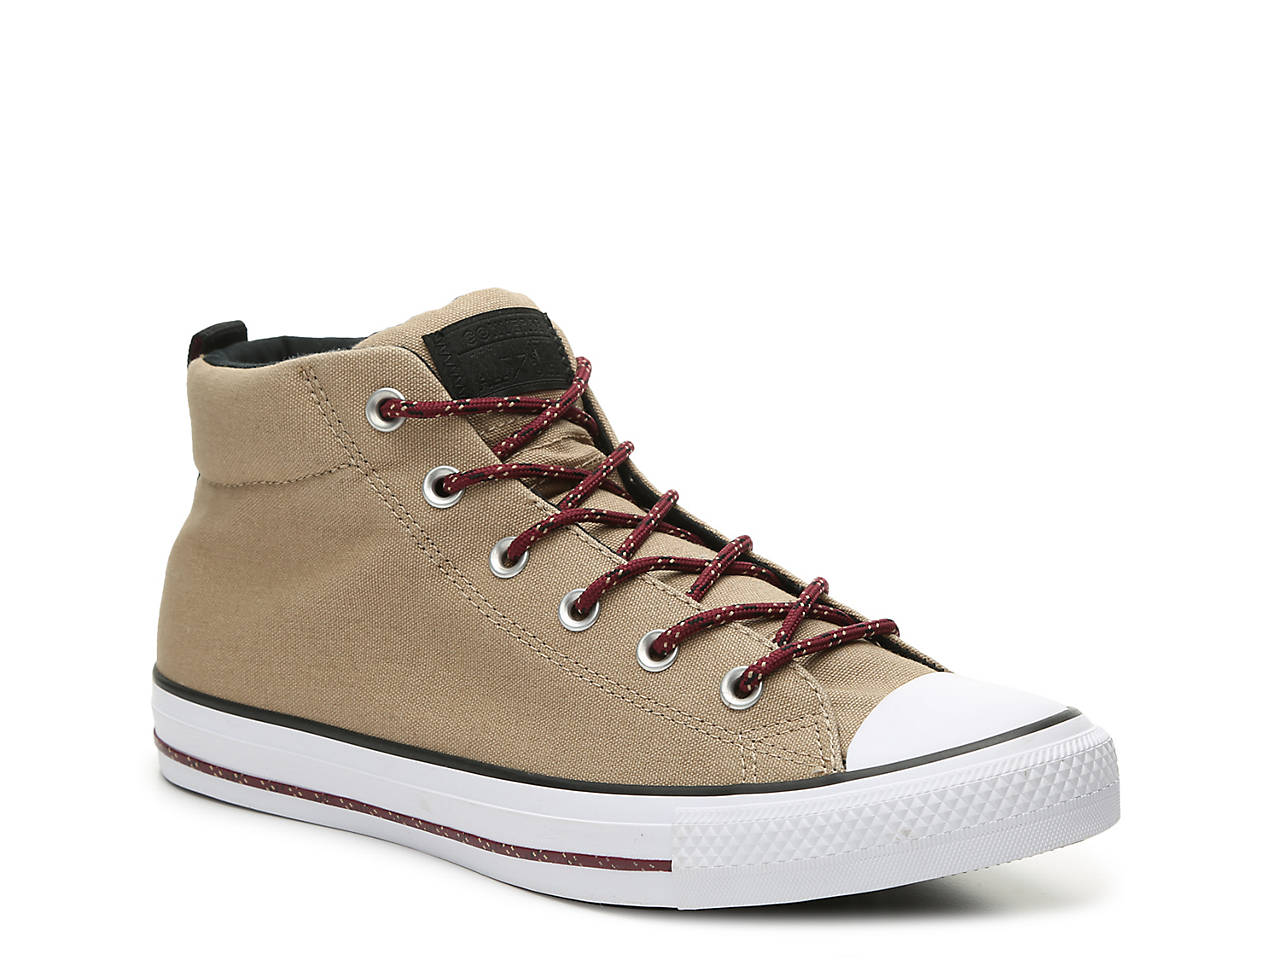 a2040104fb2 Converse Chuck Taylor All Star Street Mid-Top Sneaker - Men's Men's ...